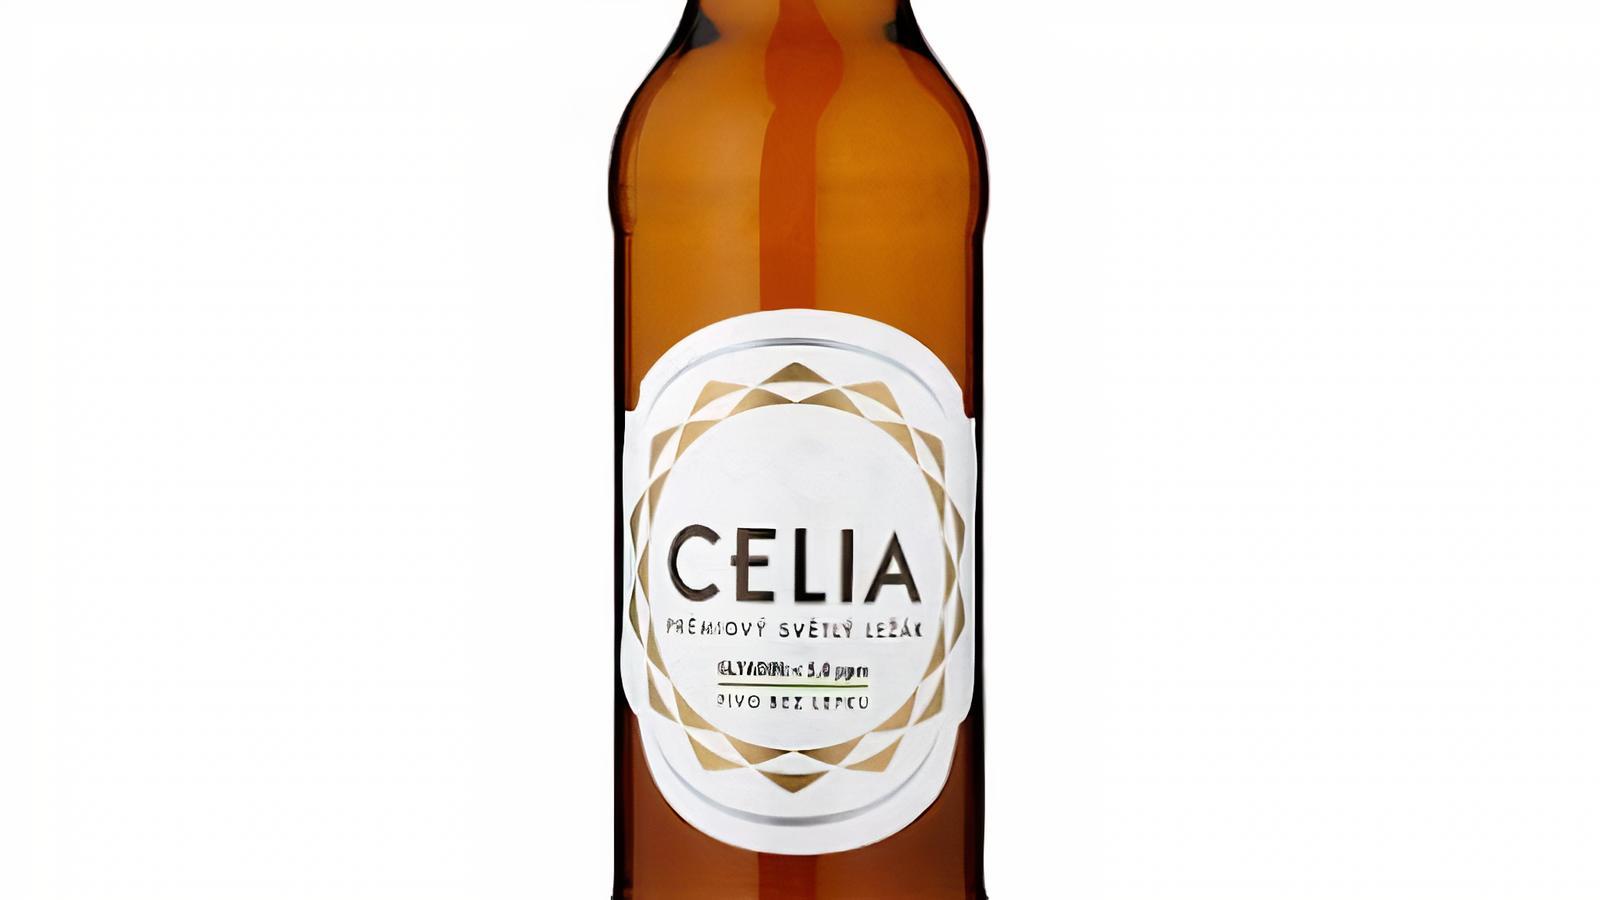 Celia Gluten Wise Organic, 330mL bottled beer (4.5% ABV)